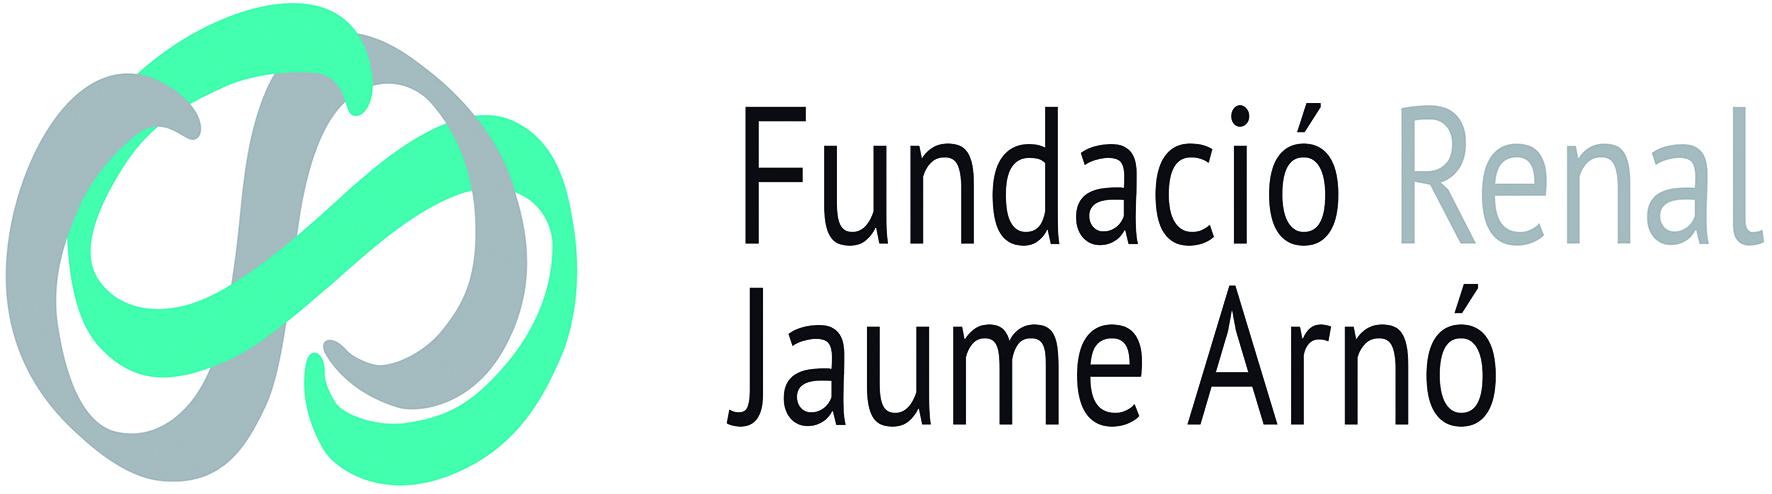 Fundació Renal Jaume Arnó, Lleida - Tarragona